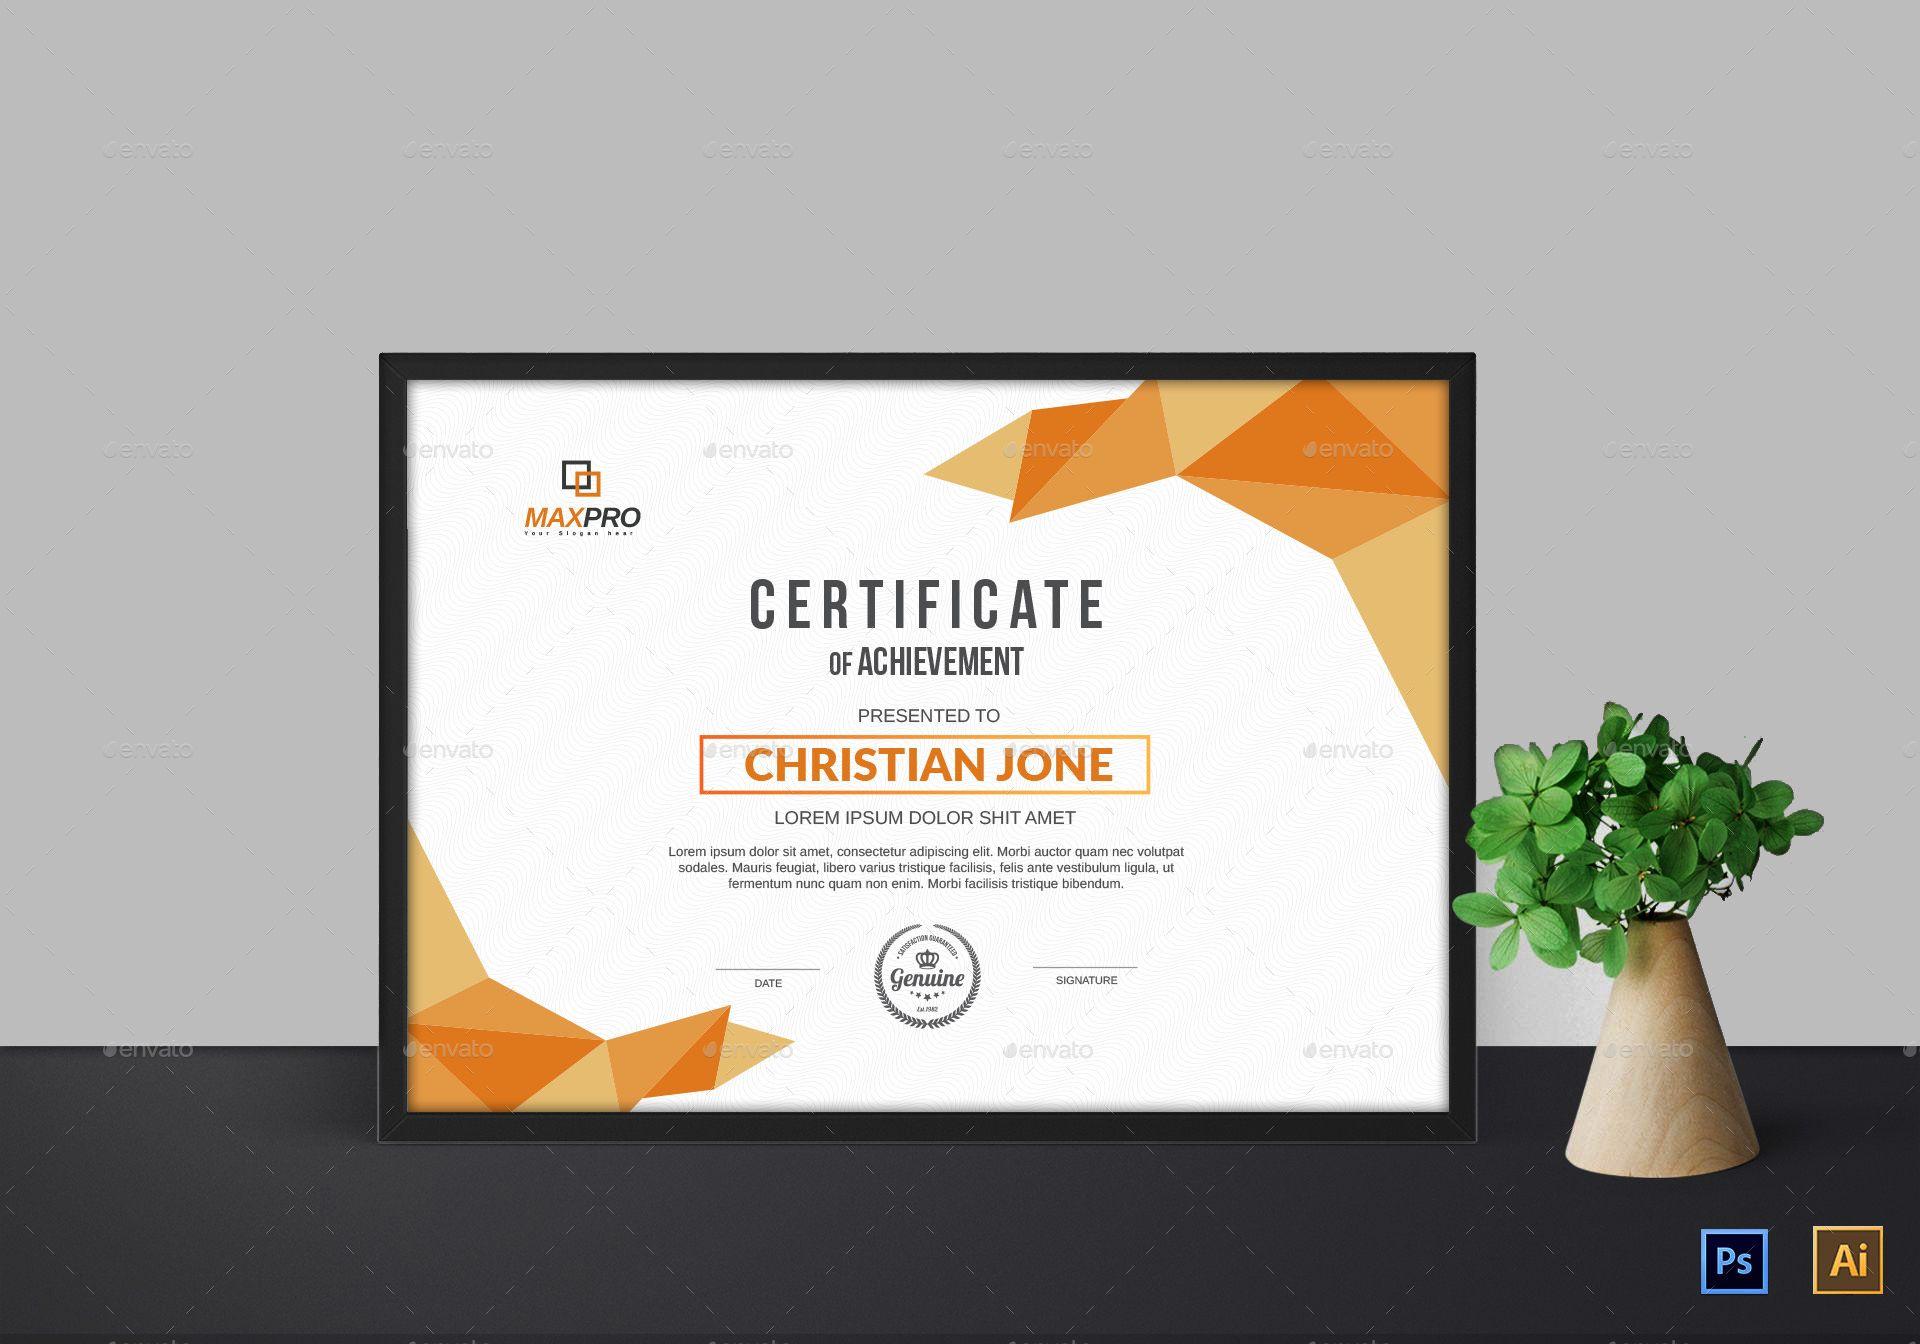 Certificate #Certificate | design font | Certificate templates